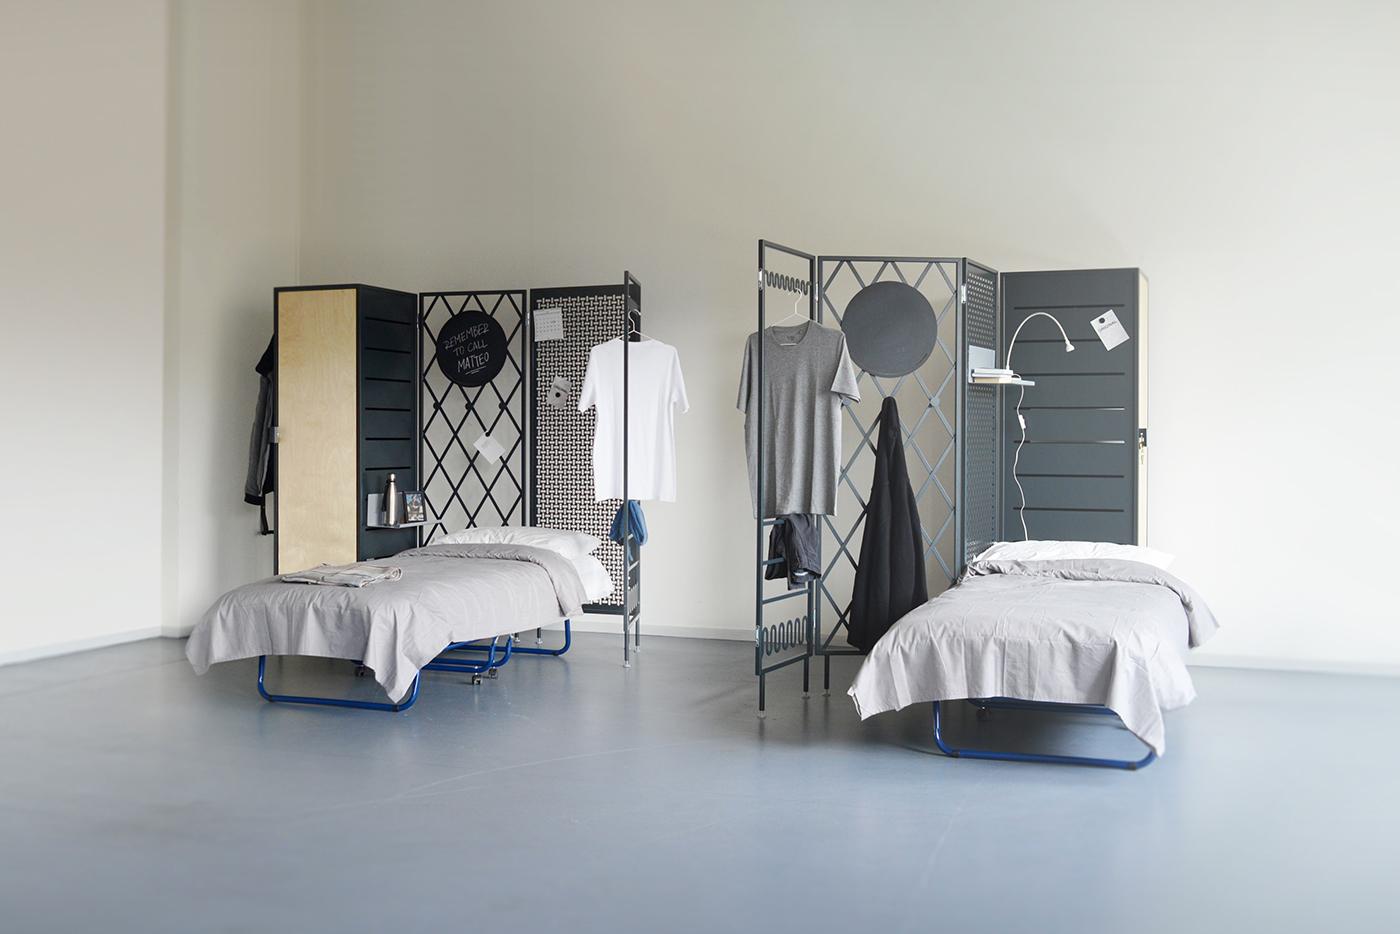 patchwork cohabitation reception centres roommates partition homeless furniture design divide space social design